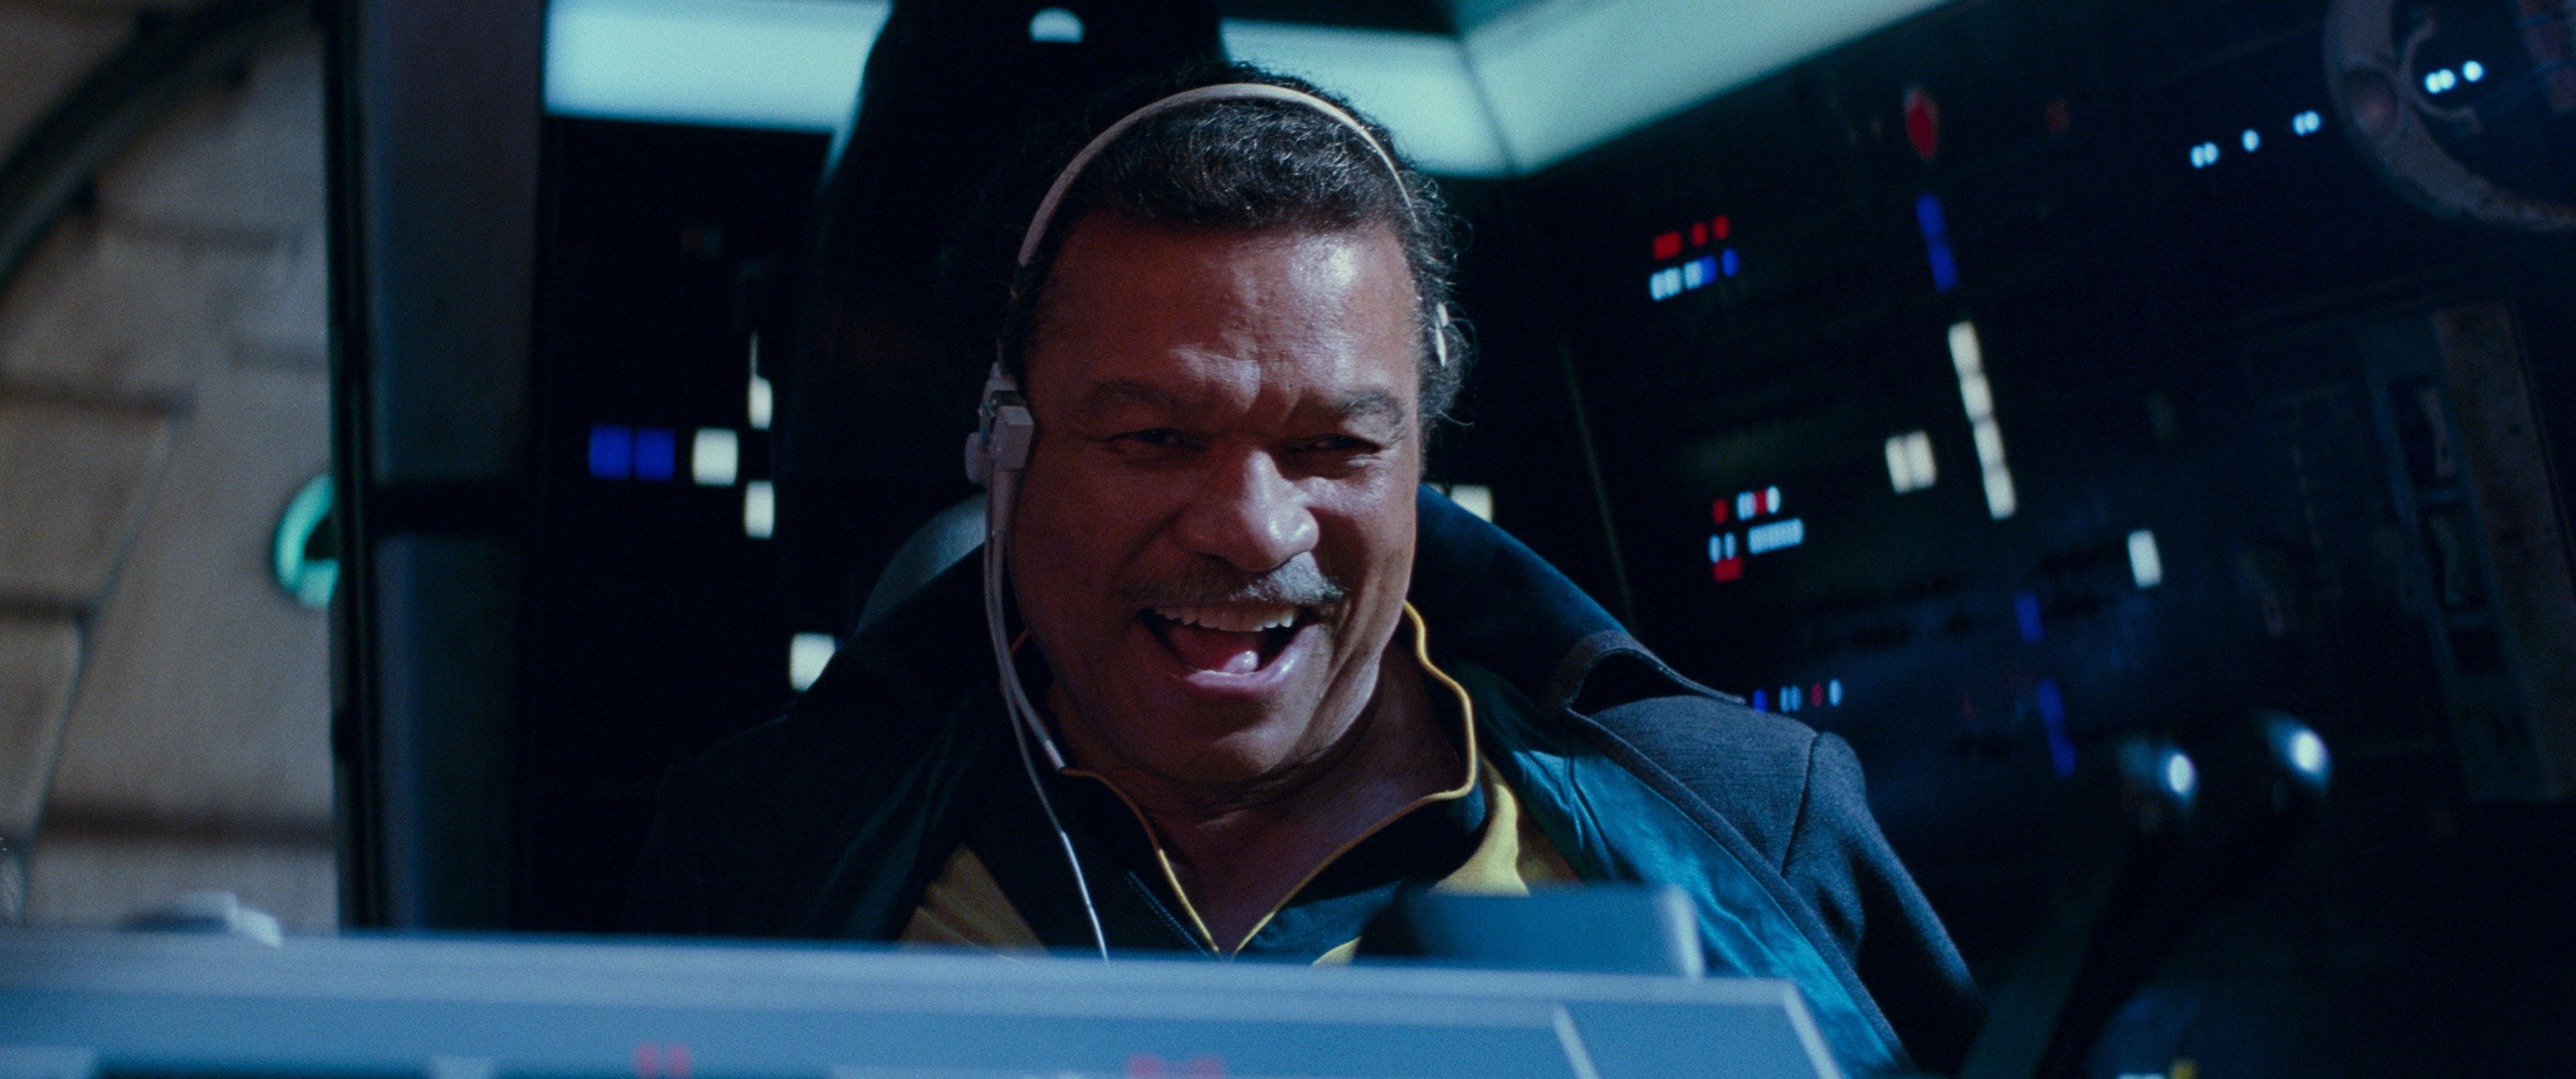 Lando Calrissian Star Wars Episode IX